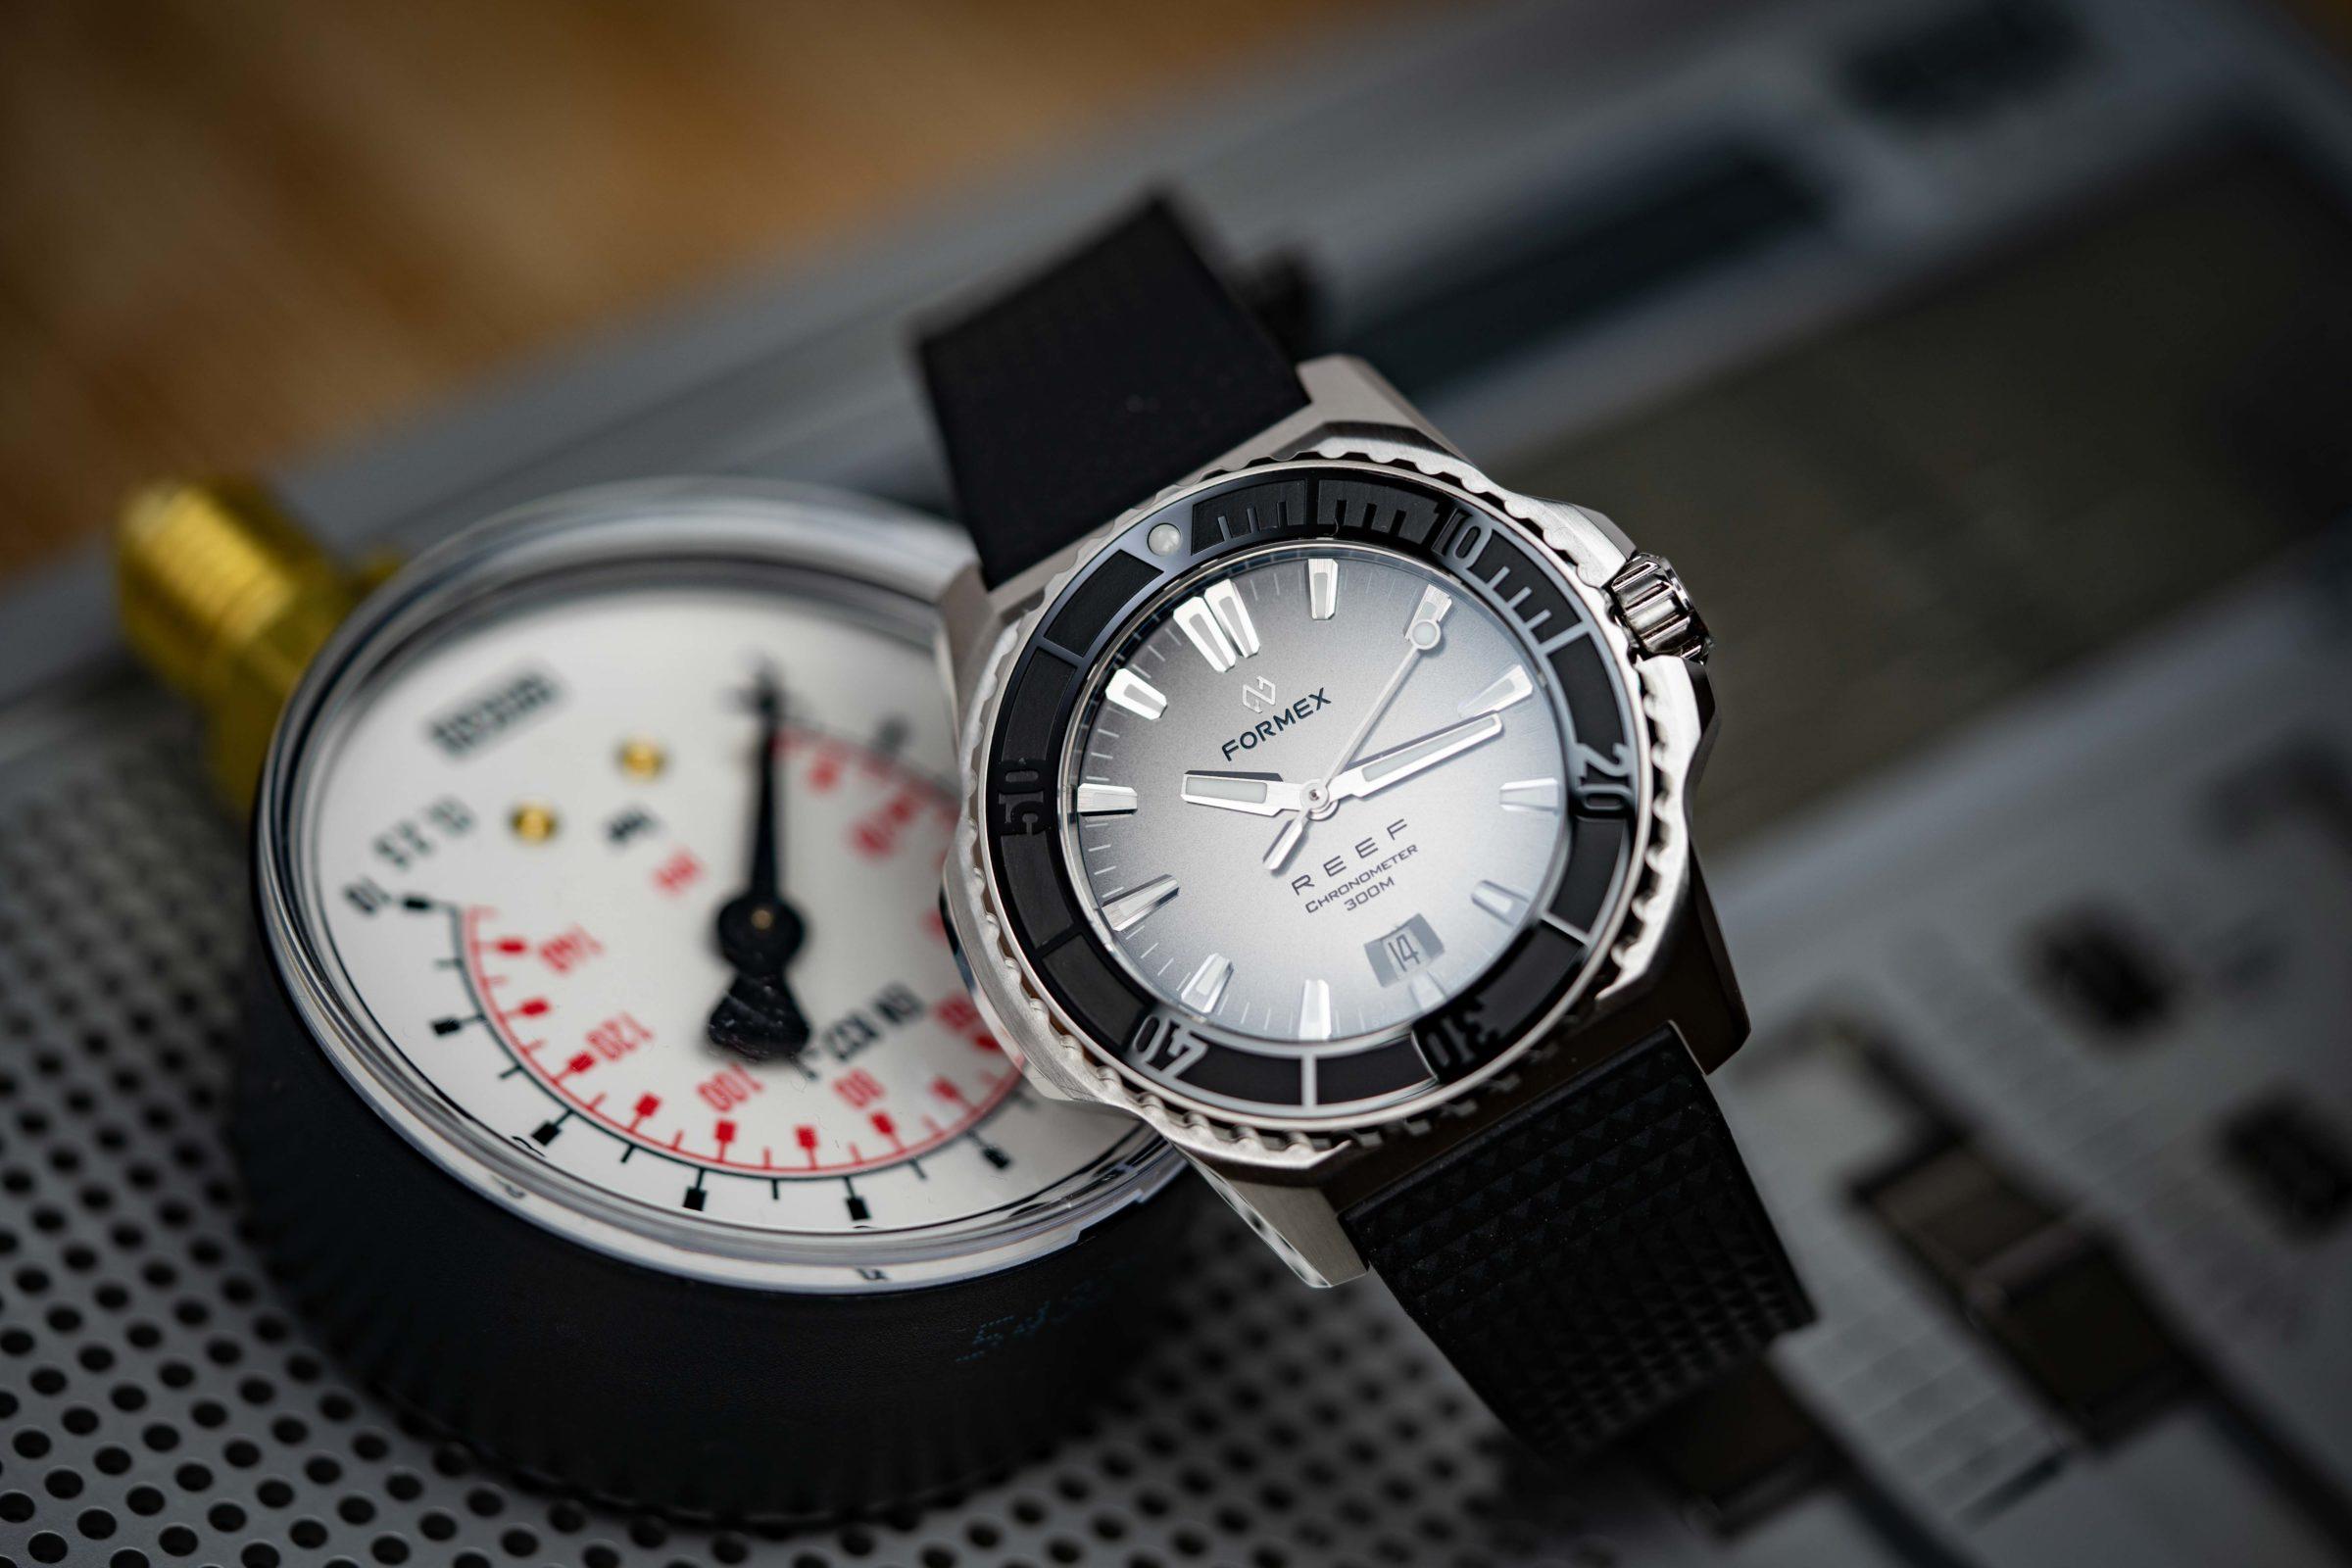 Formex-Reef-Automatik-Chronometer-300m-Review